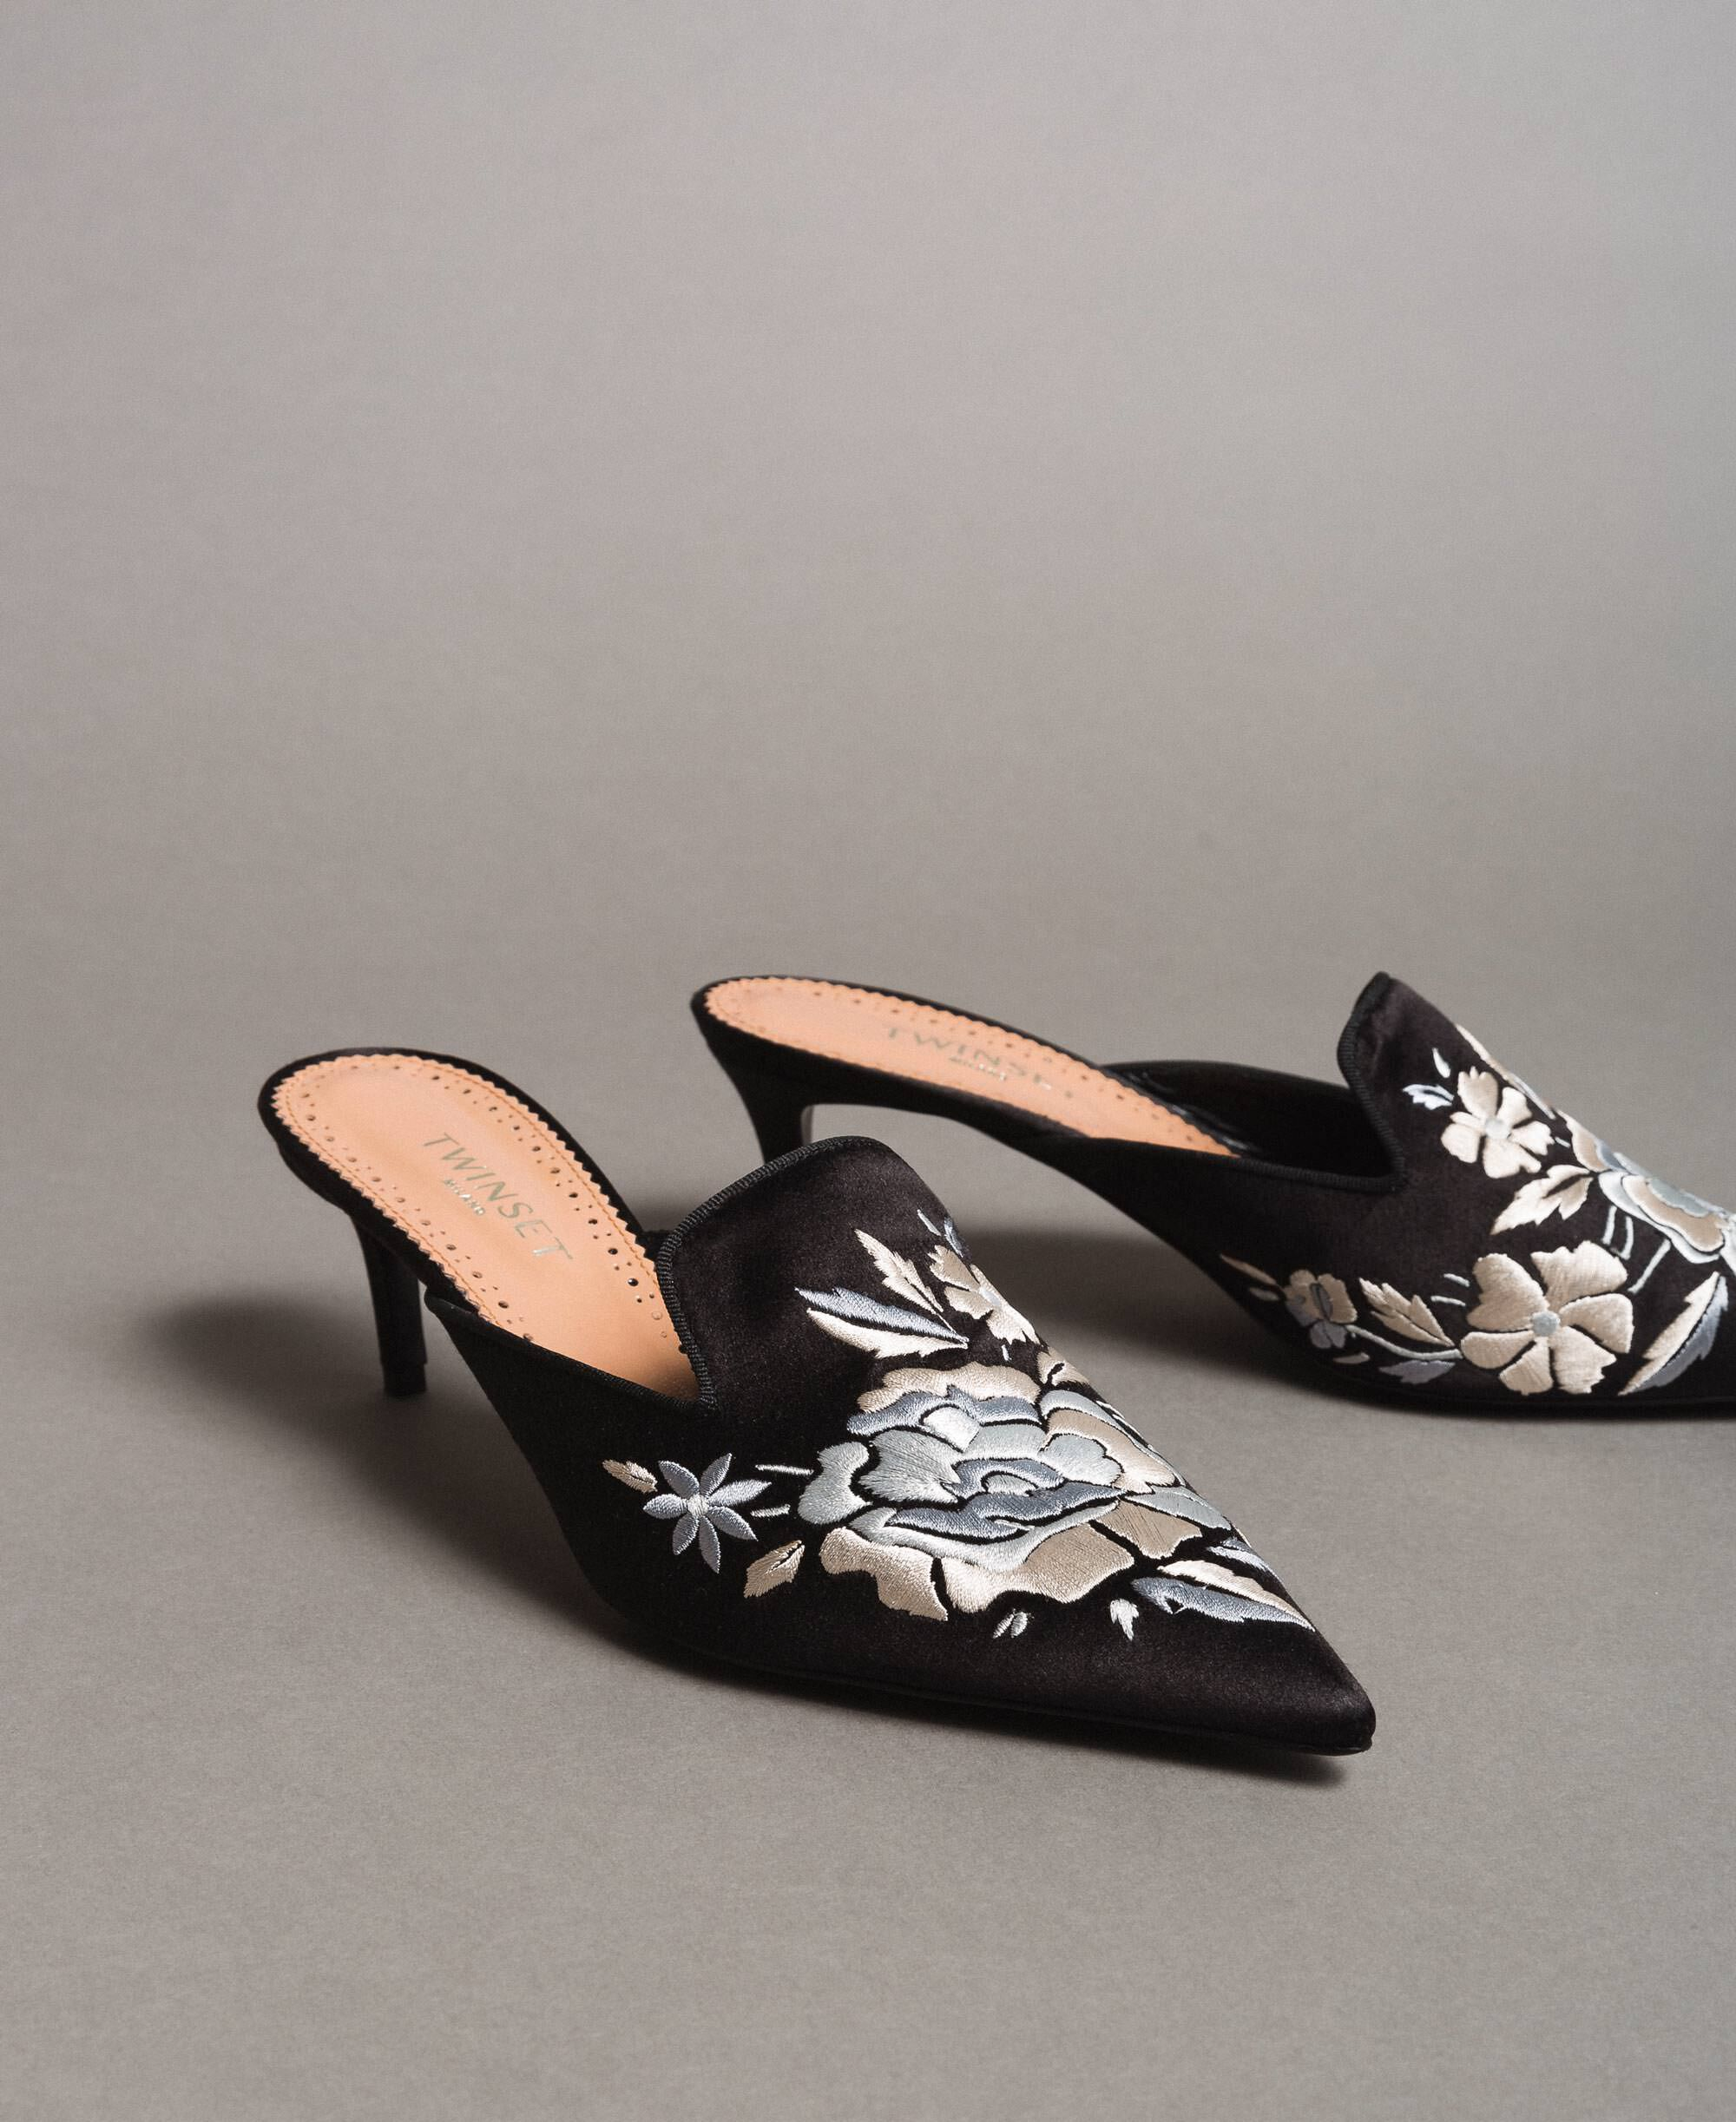 945824e2d4a Shoes Woman - Spring Summer 2019